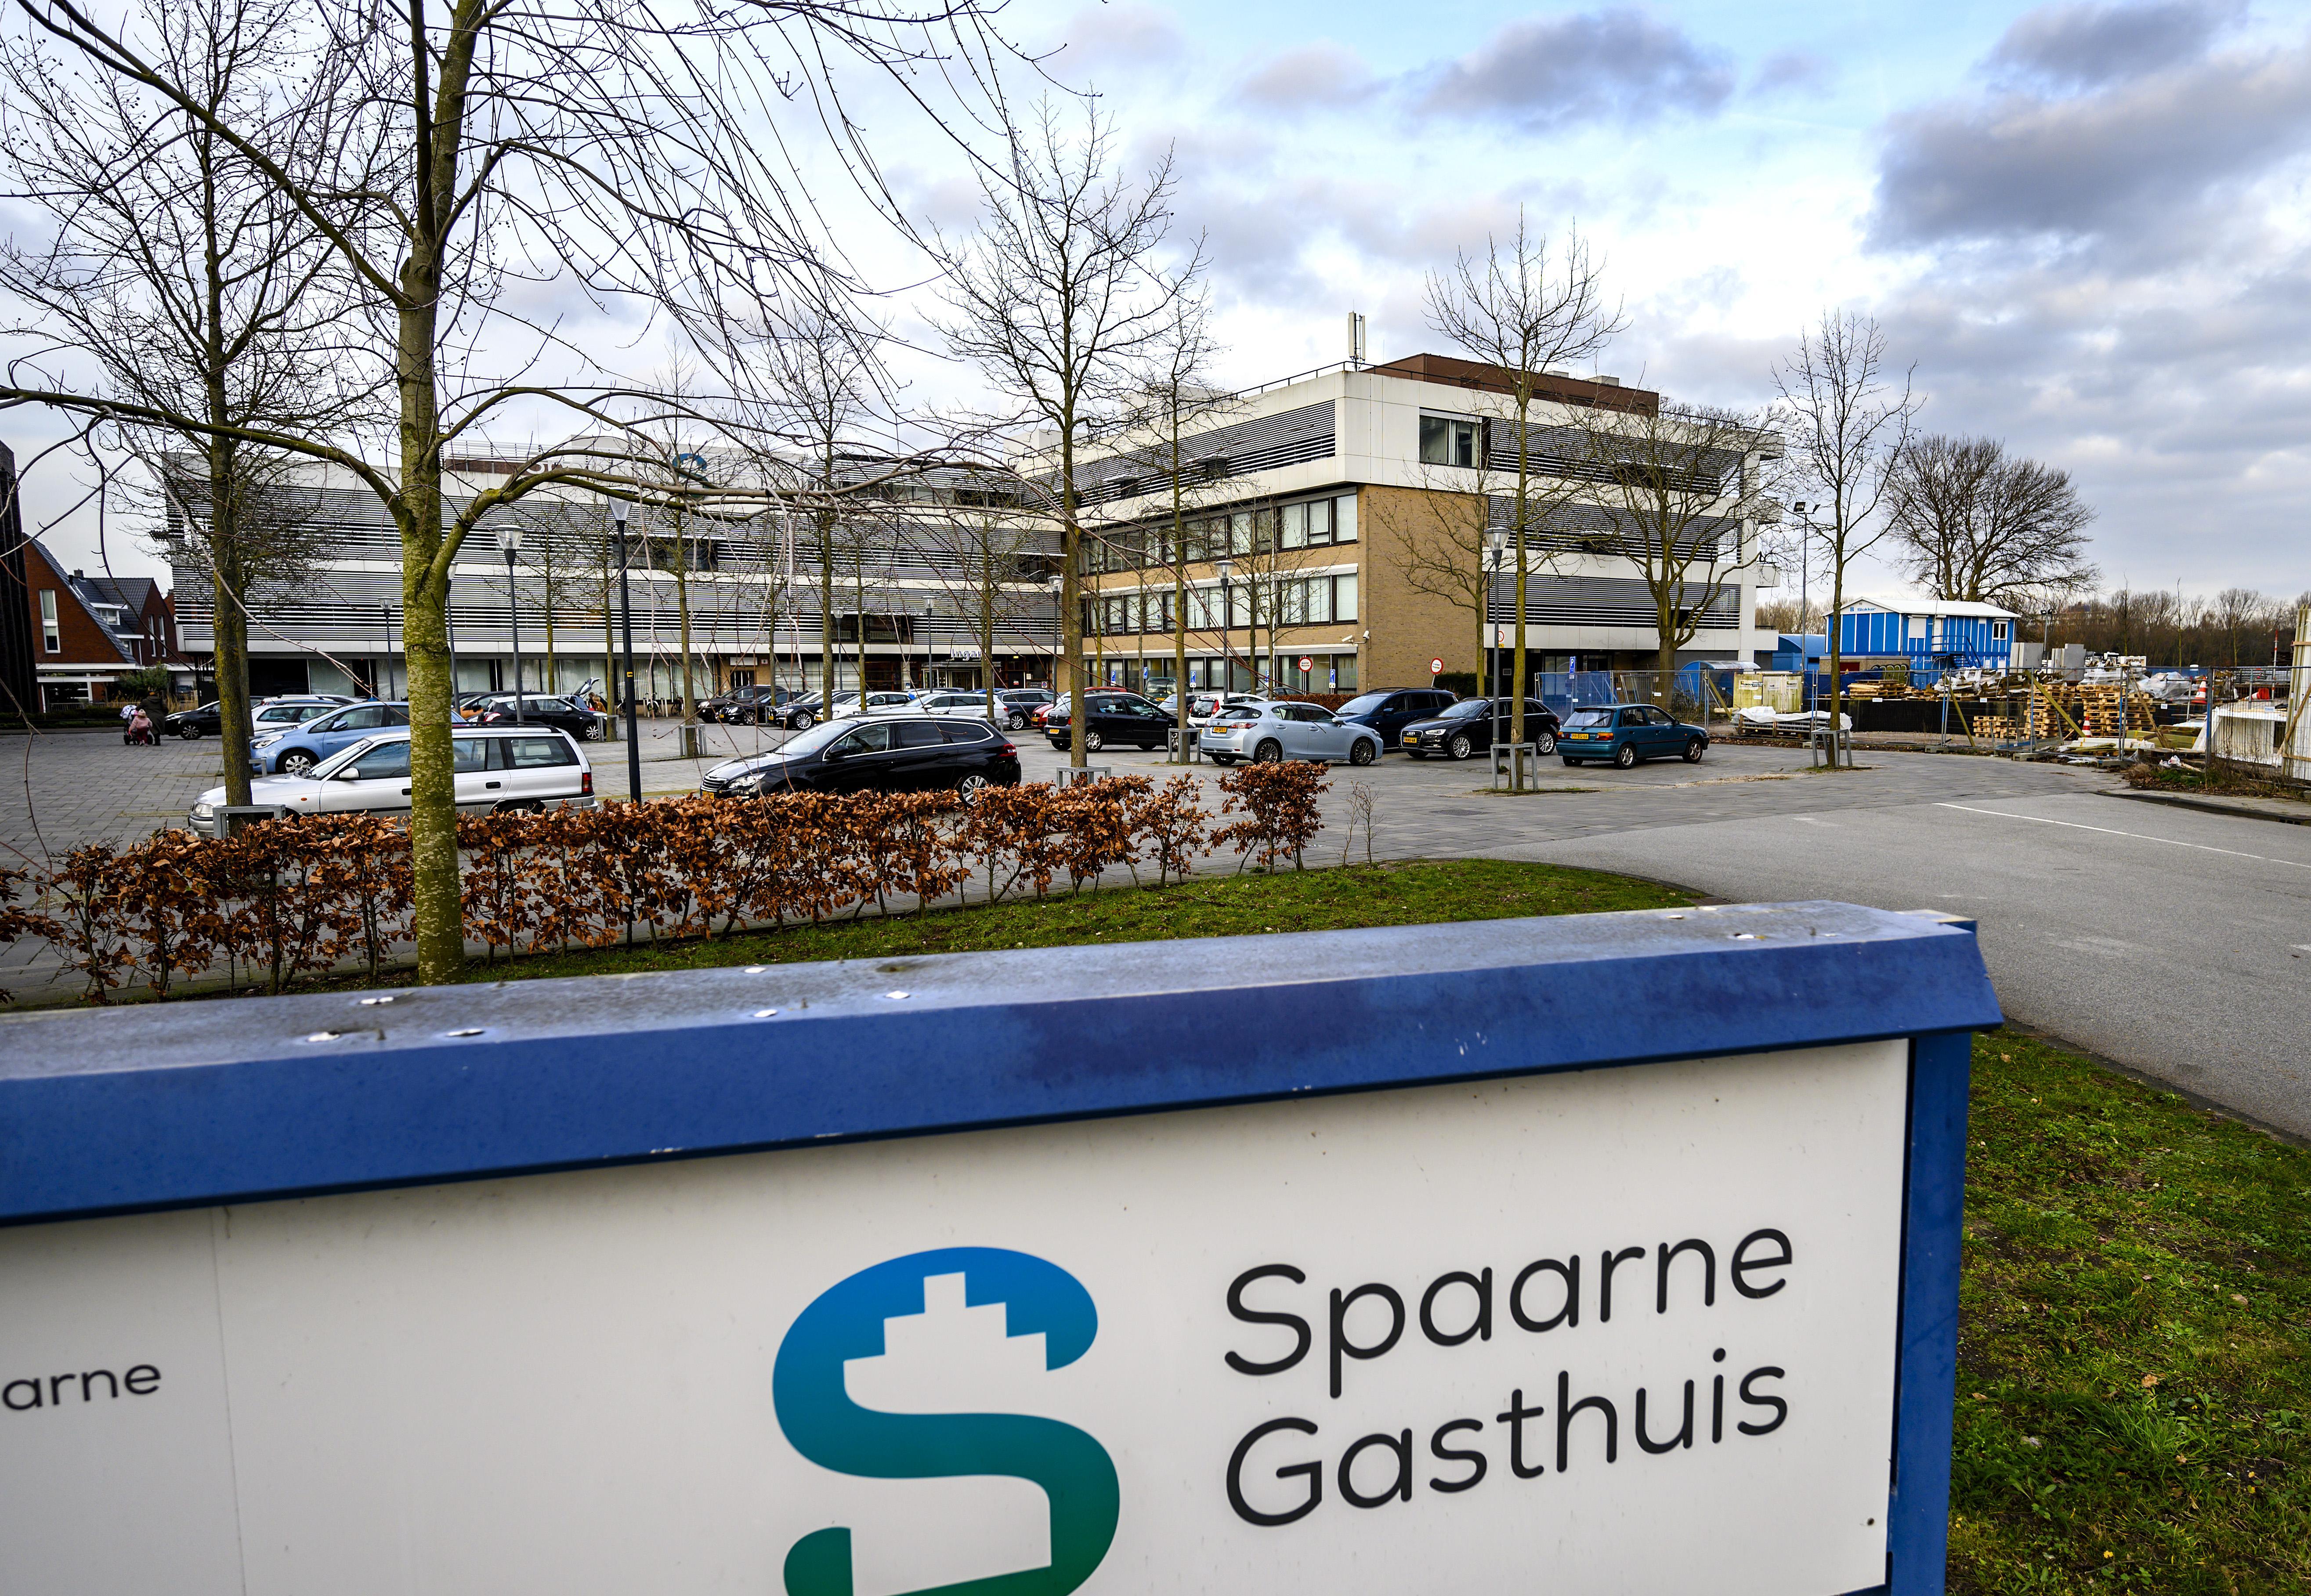 Omwonenden 'oude' Spaarne Gasthuis in Heemstede teleurgesteld over inspraak tijdens verkoopproces